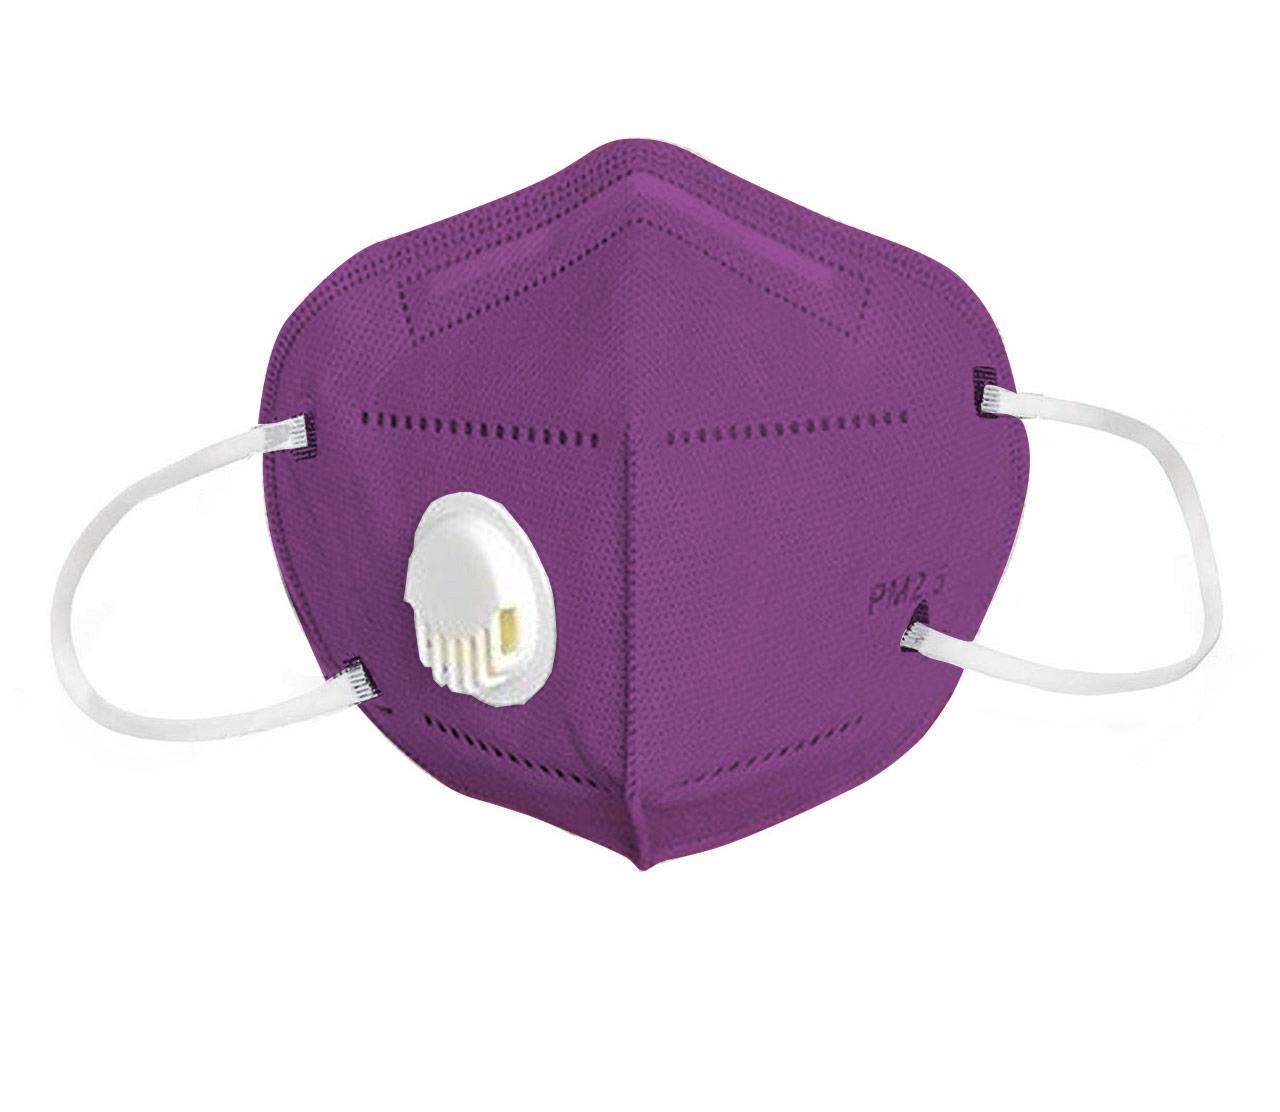 Reusable Face Mask Purple-2 pack